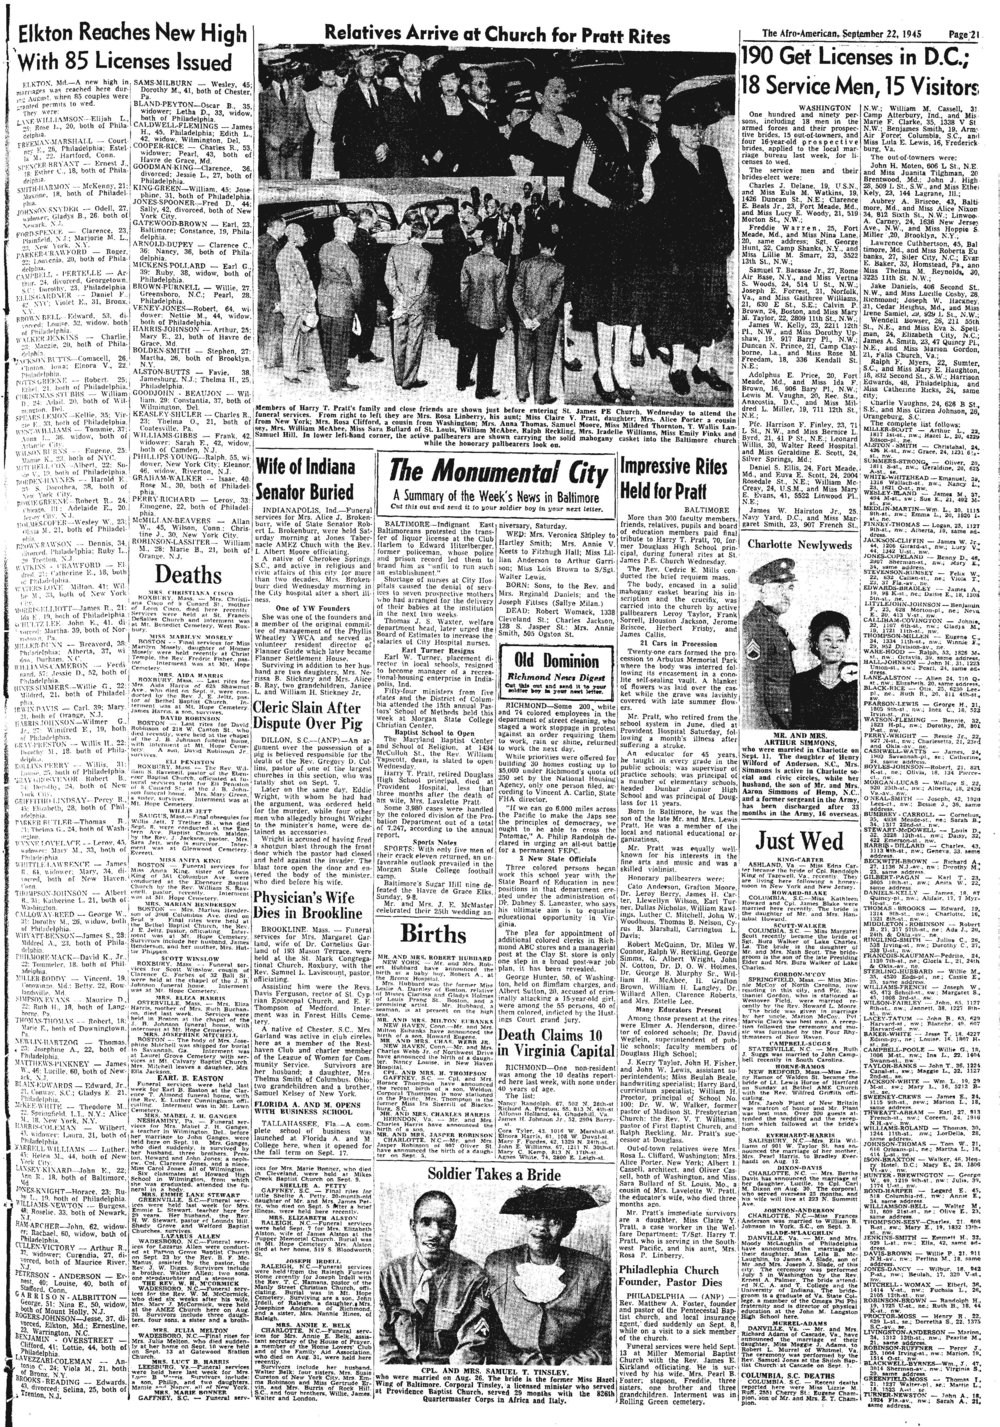 1945-9-22-Impressive_Rites_Held_for_Prat.jpg